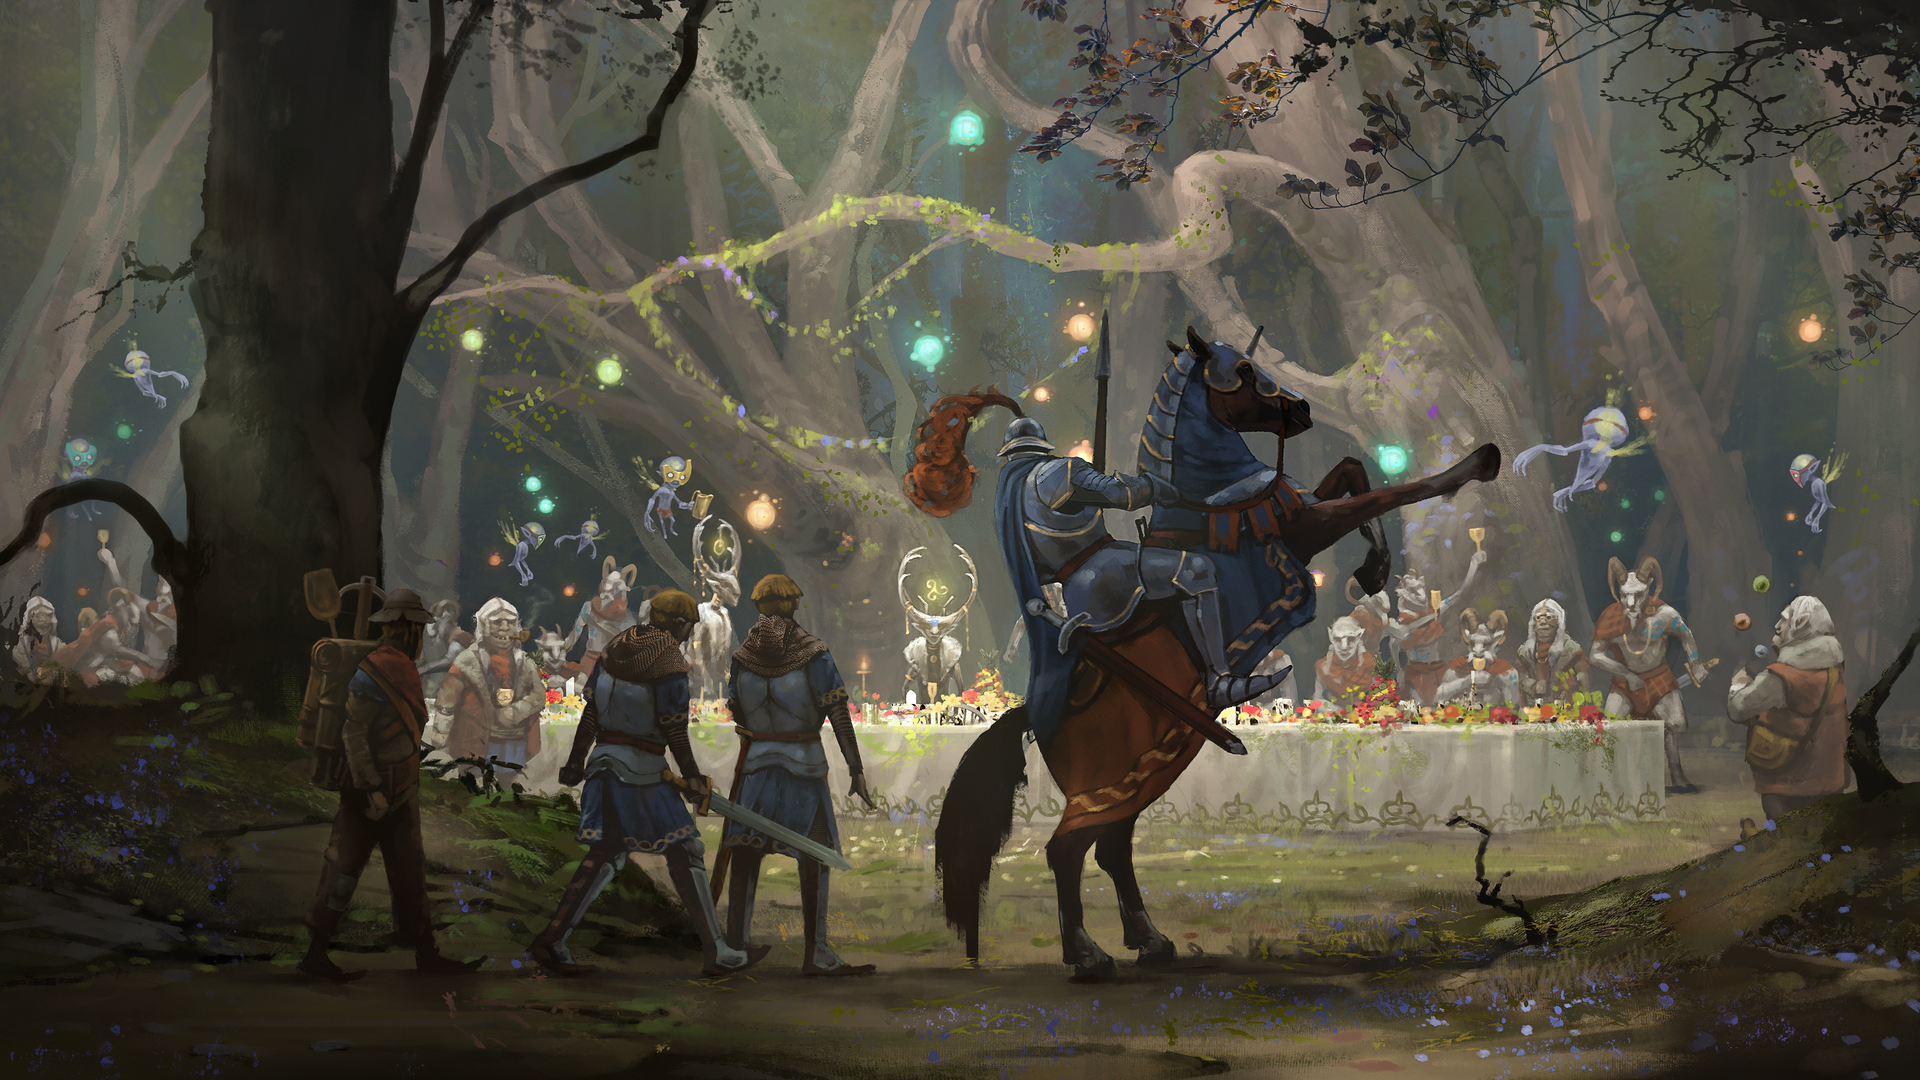 Knight_encounters_faye_HD.png